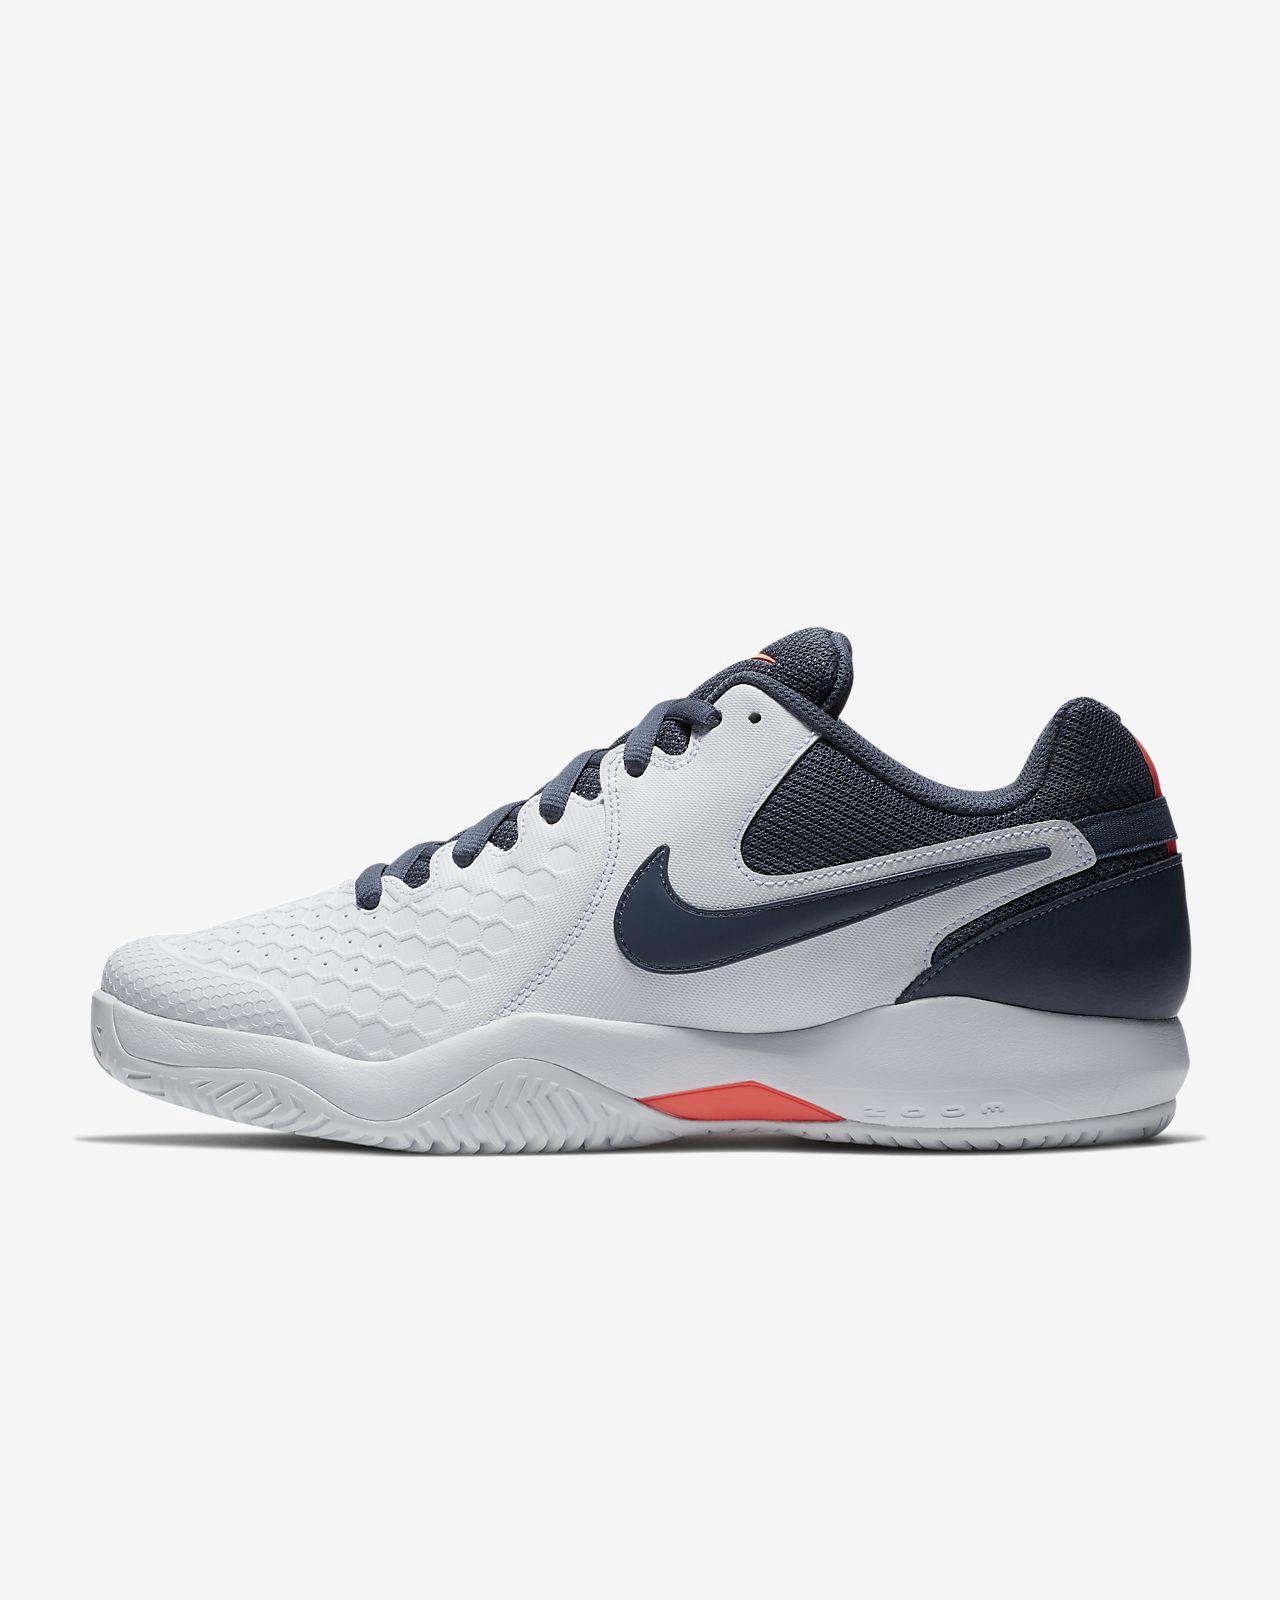 e888e890c1 NikeCourt Air Zoom Resistance Men's Hard Court Tennis Shoe by Nike ...